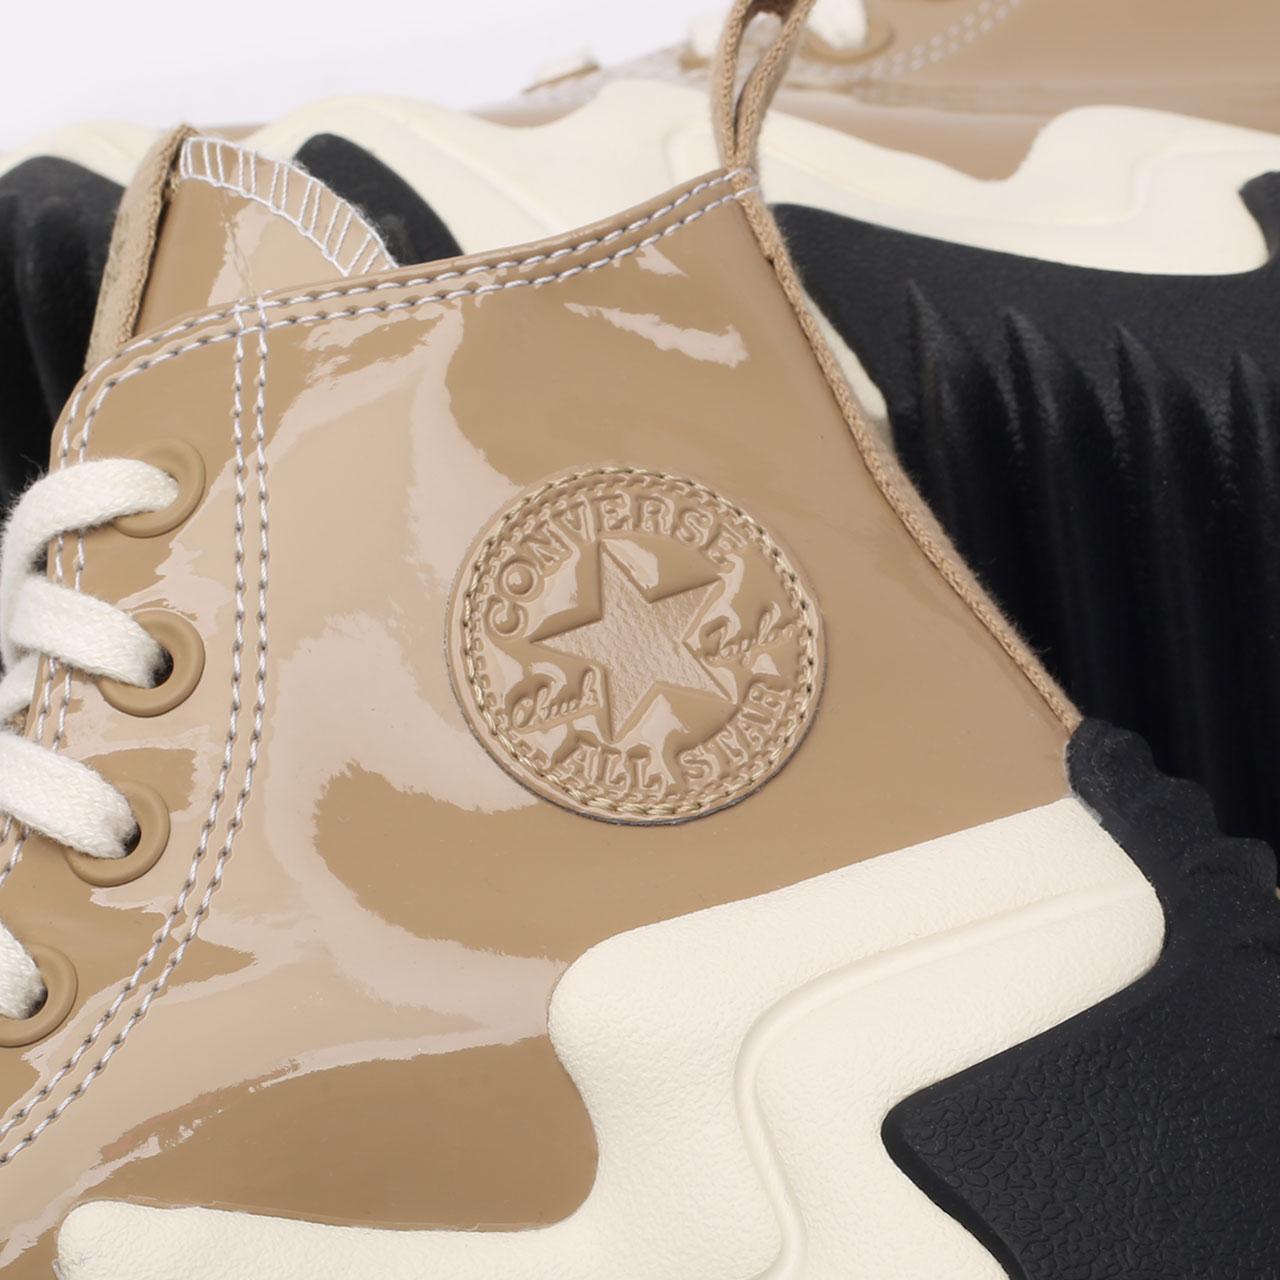 бежевые  кеды converse run star motion hi 171423 - цена, описание, фото 5